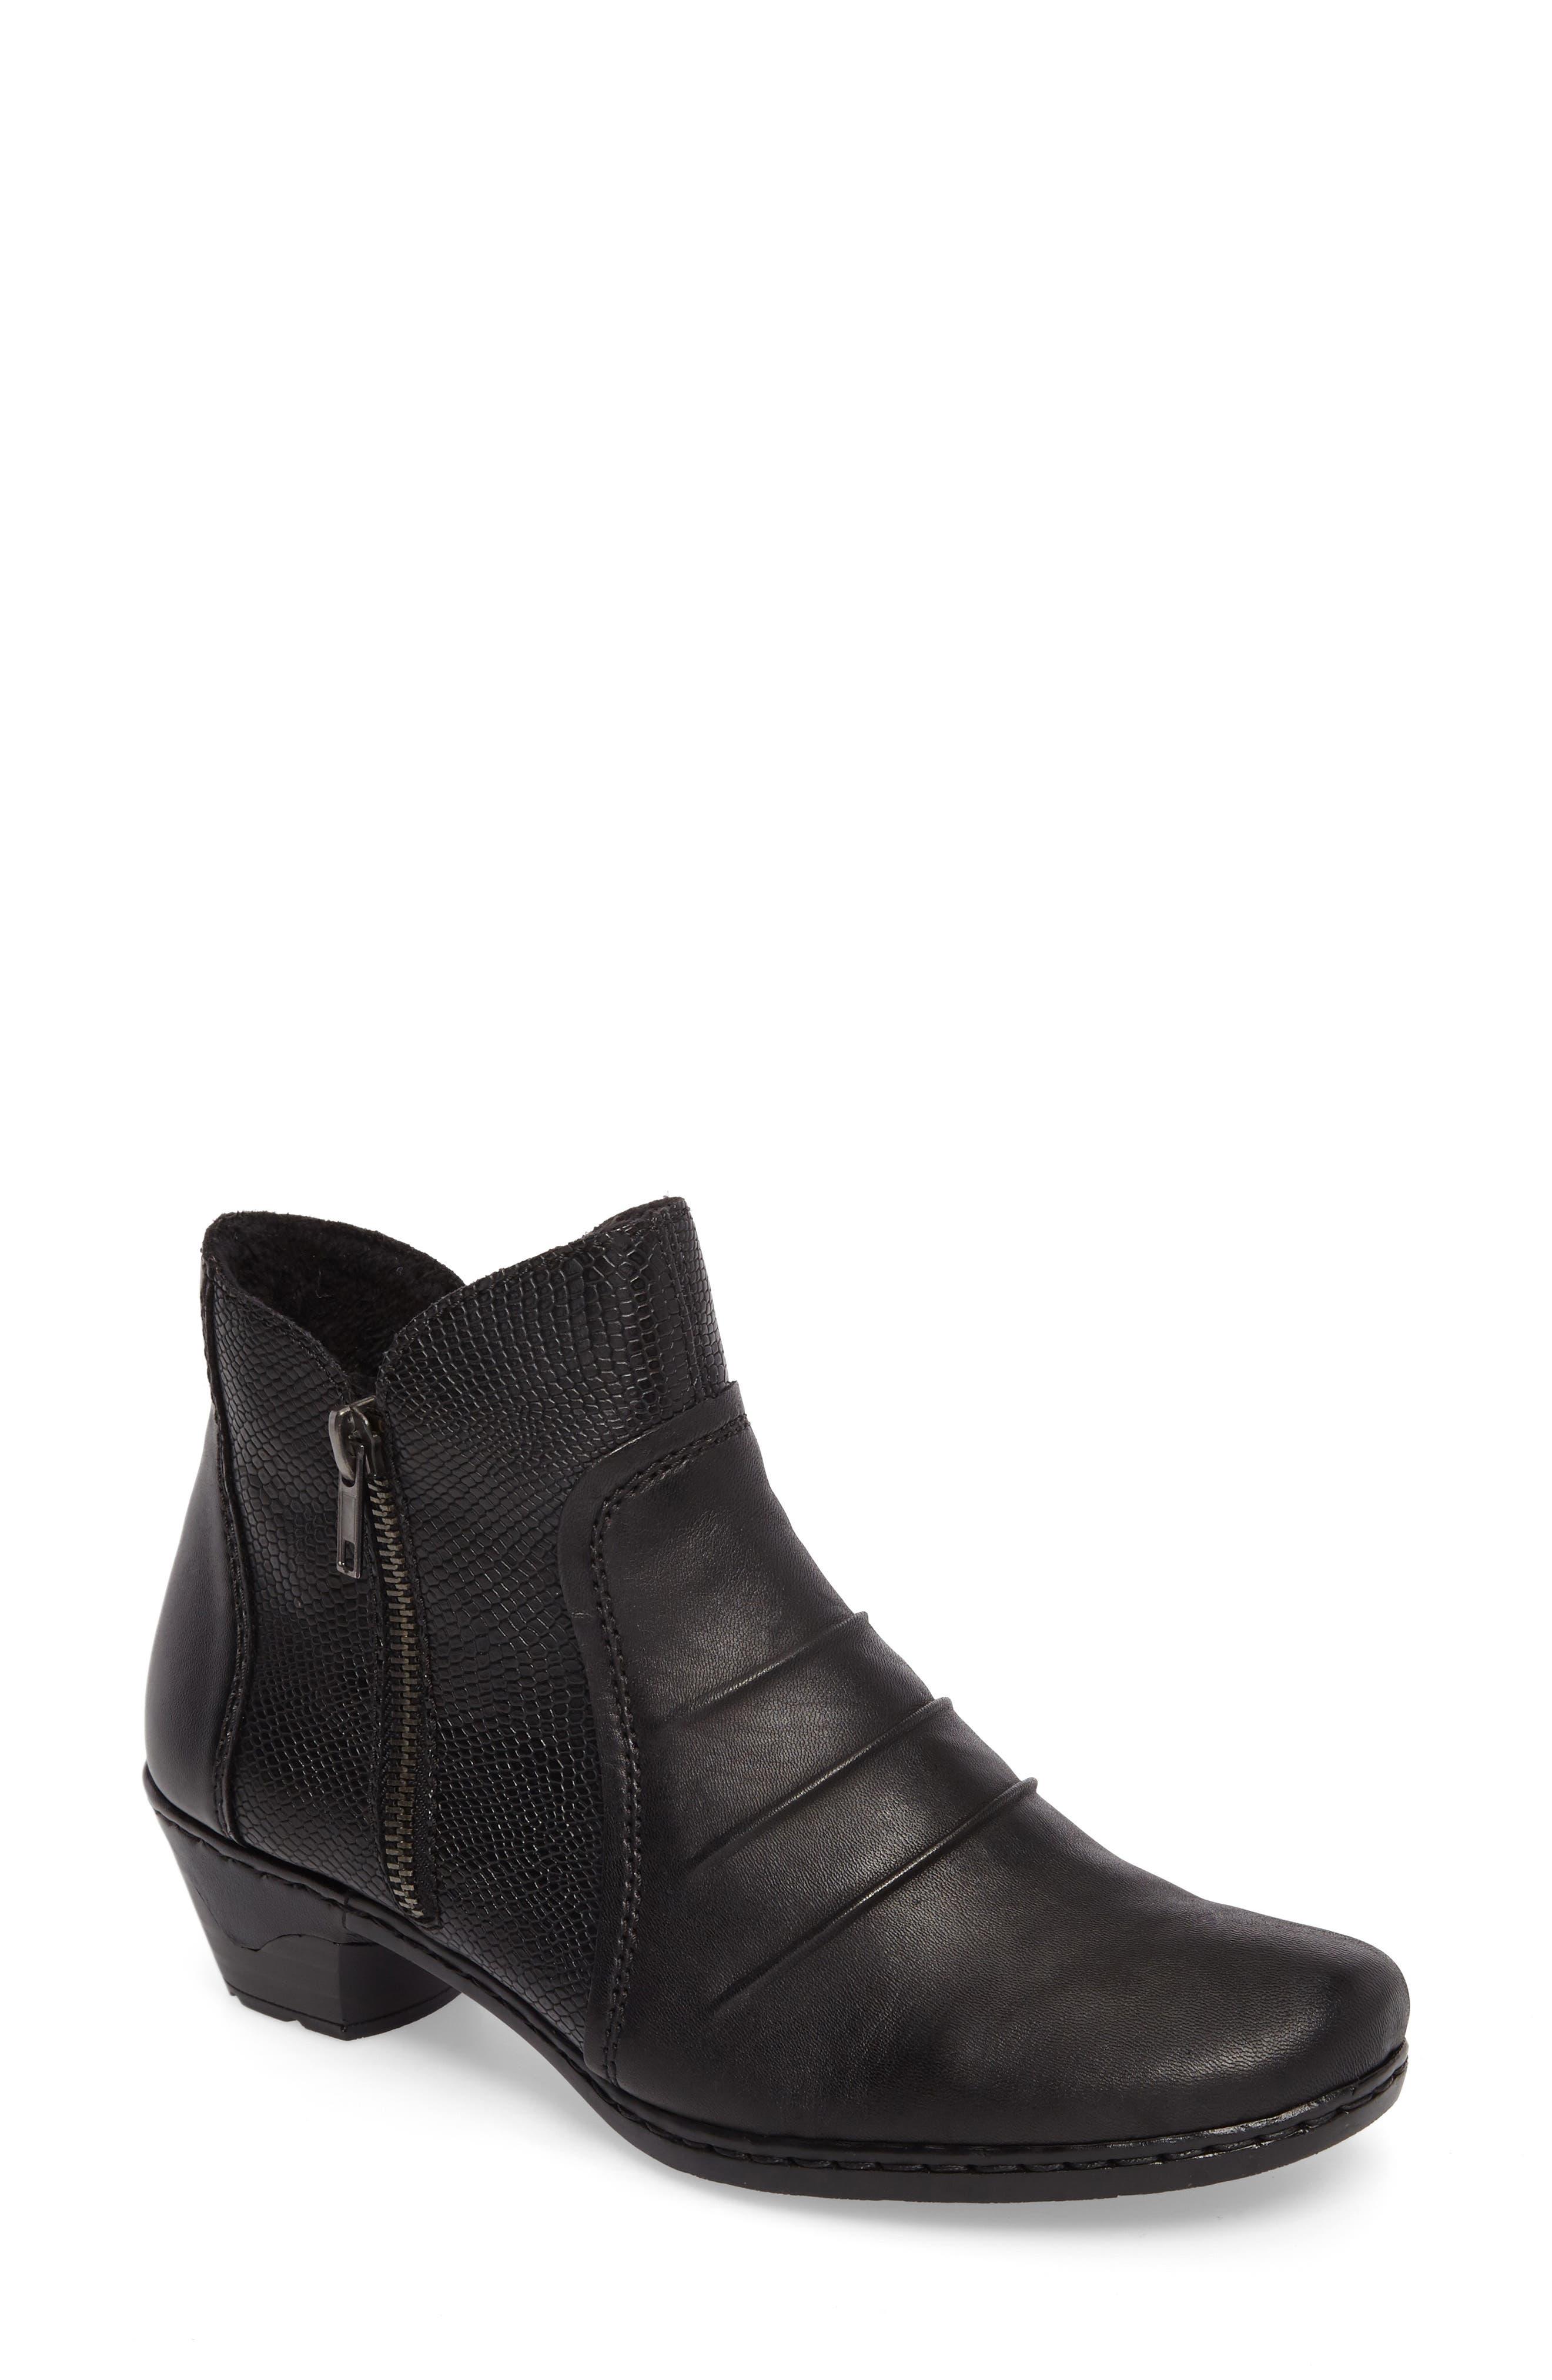 Lynn 62 Bootie,                         Main,                         color, Schwarz Nero Leather